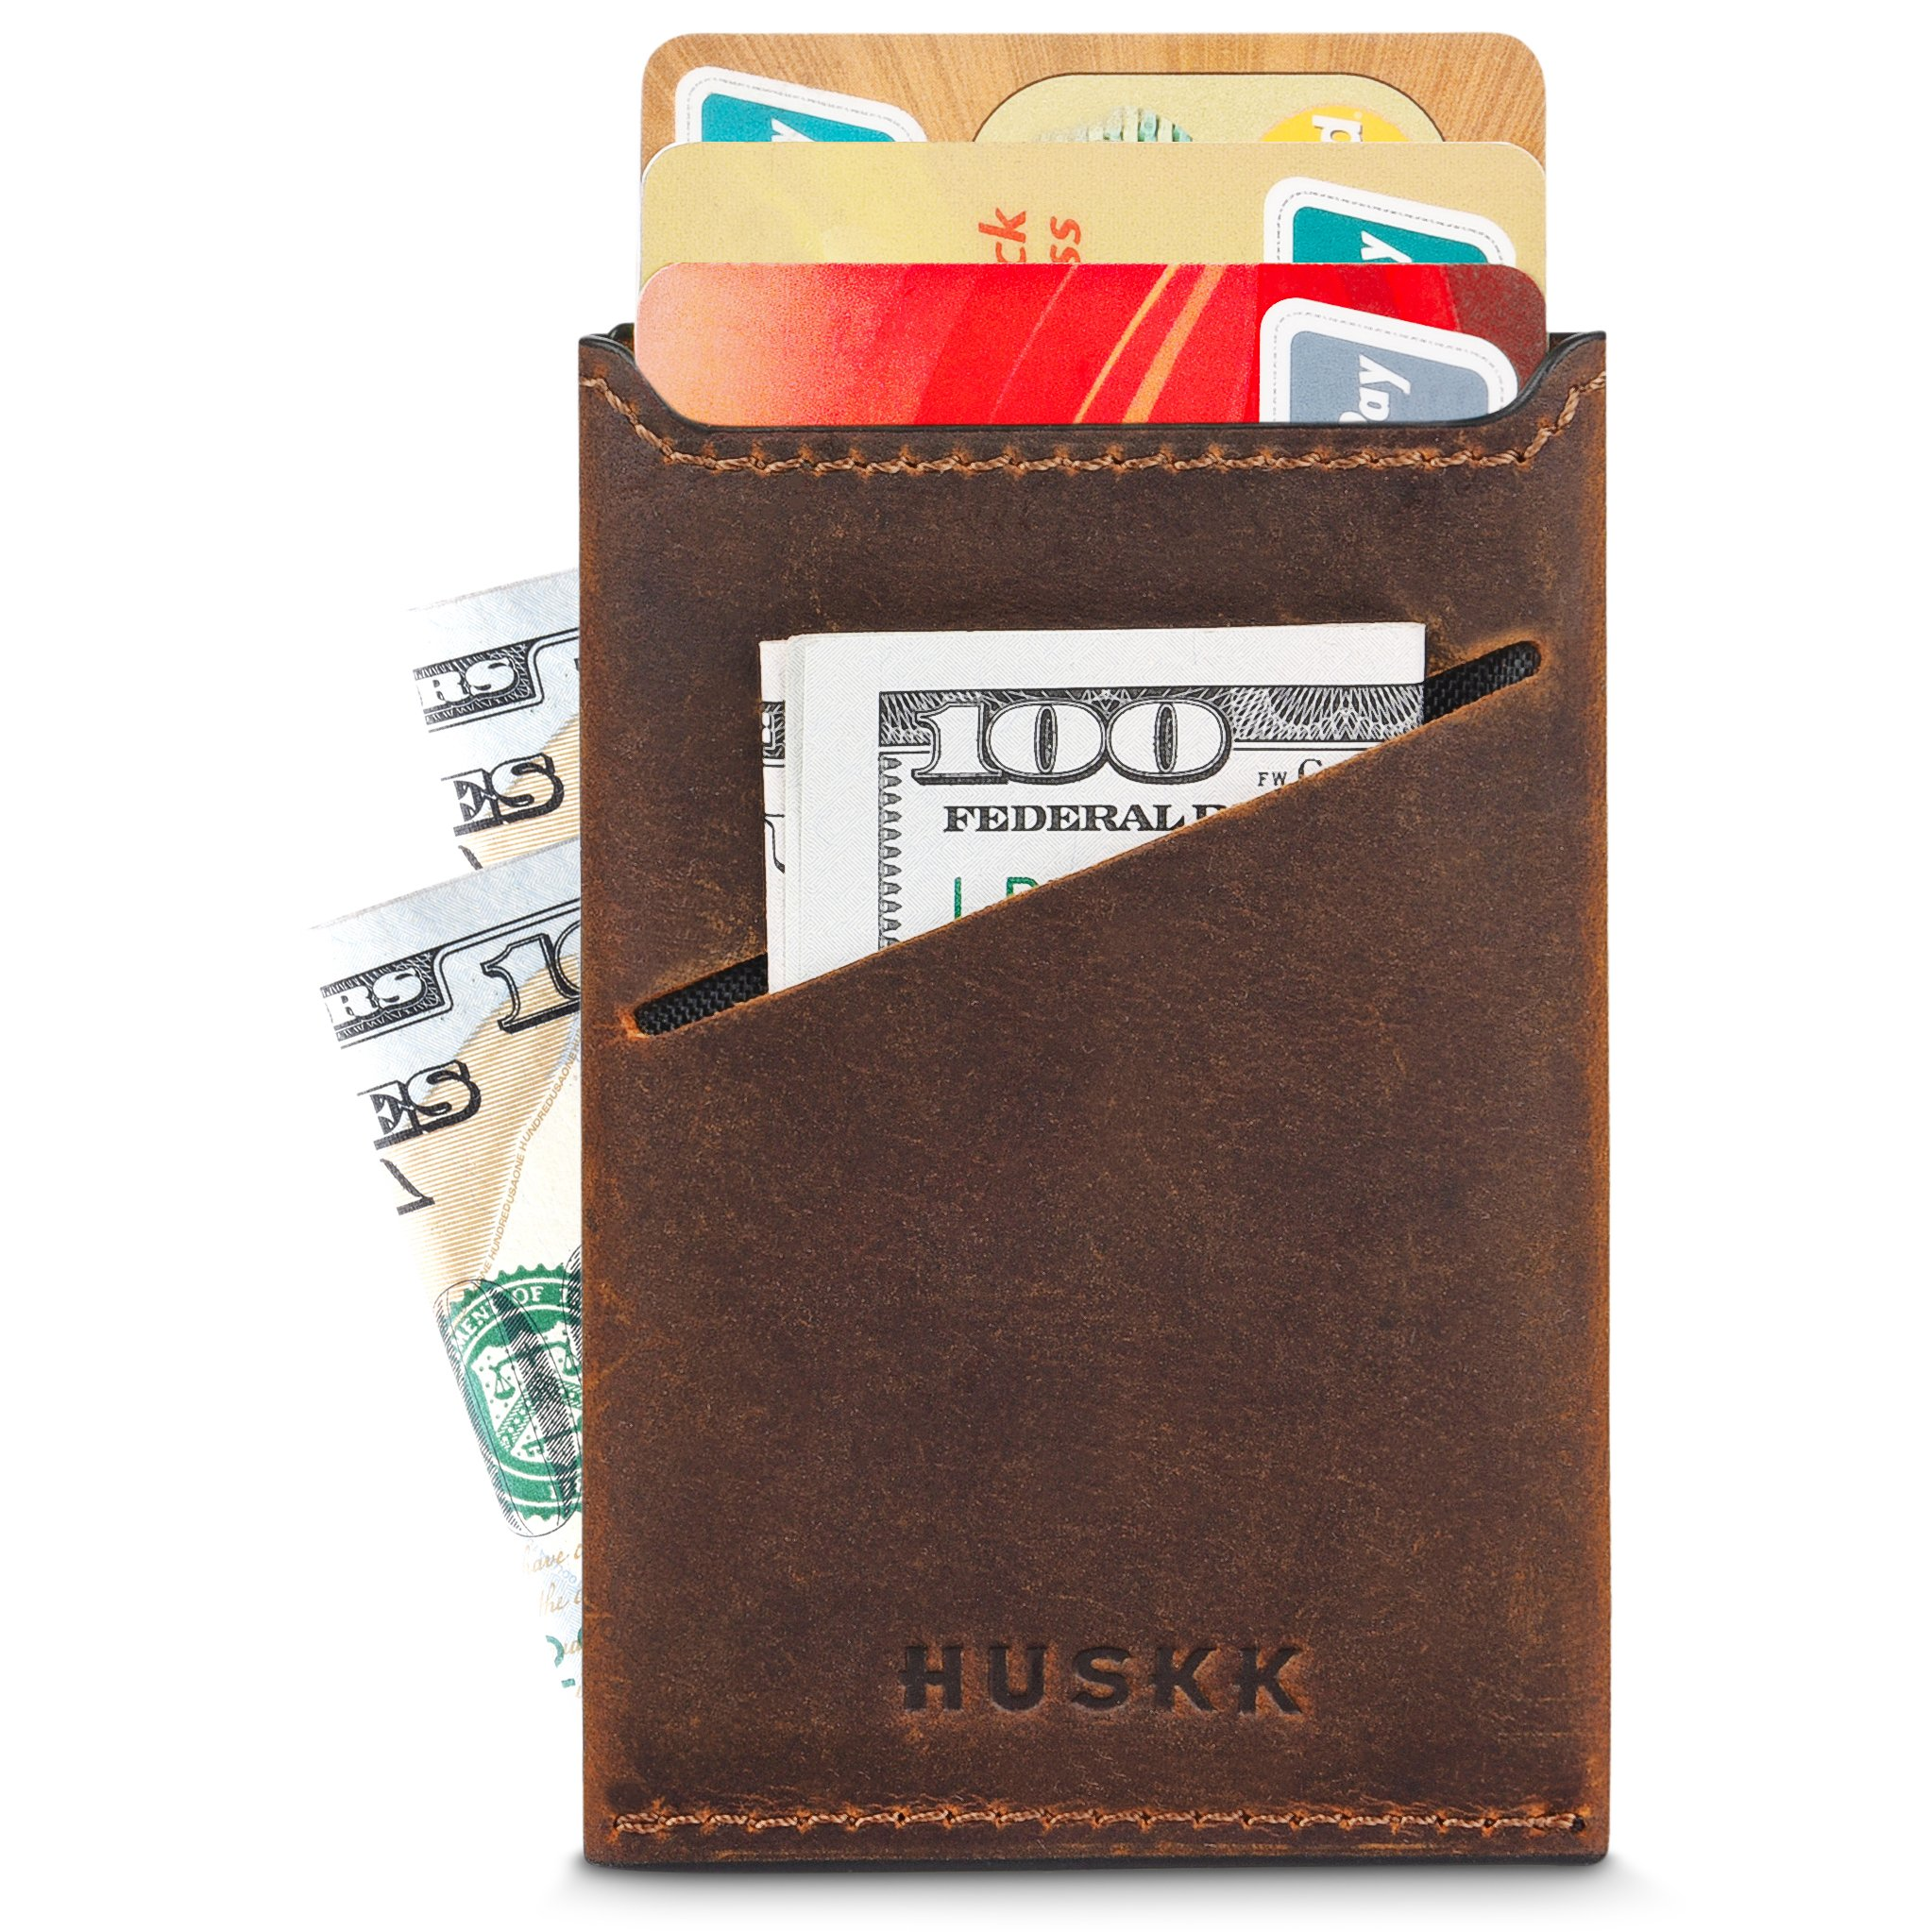 Wallets for Men - Mens Wallets - Slim Front Pocket Card Holder Sleeve - RFID Blocking (One Size, CSC5-DBCH)